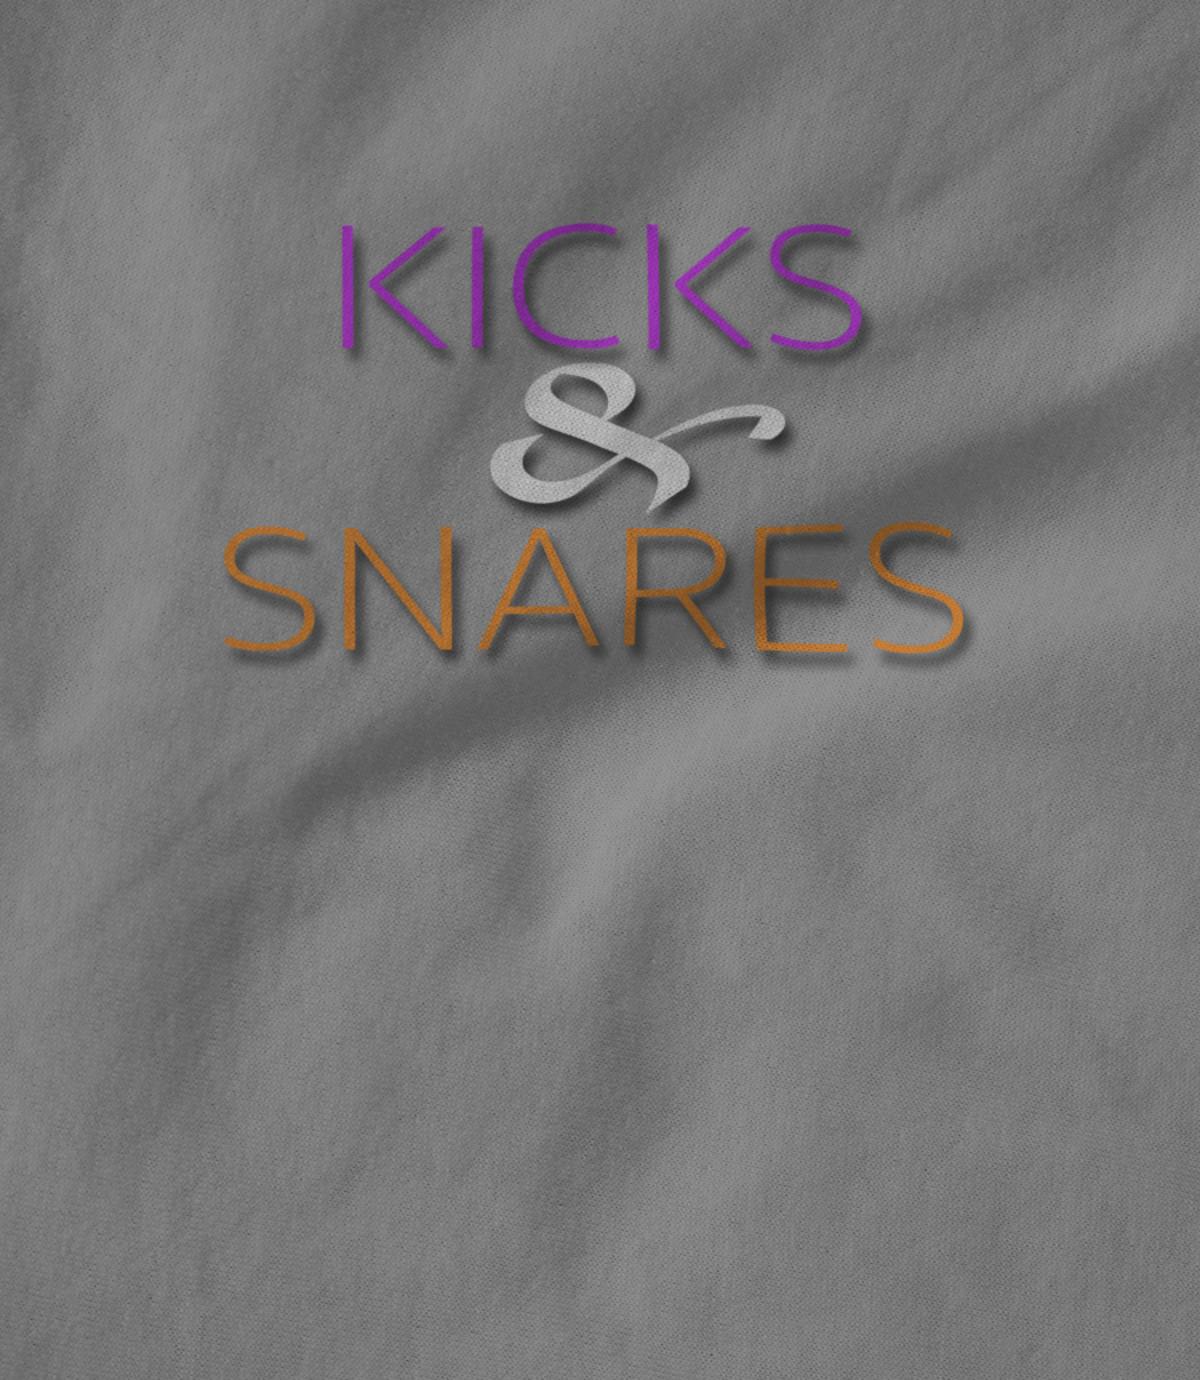 Tmsd kicks   snares 1543861506